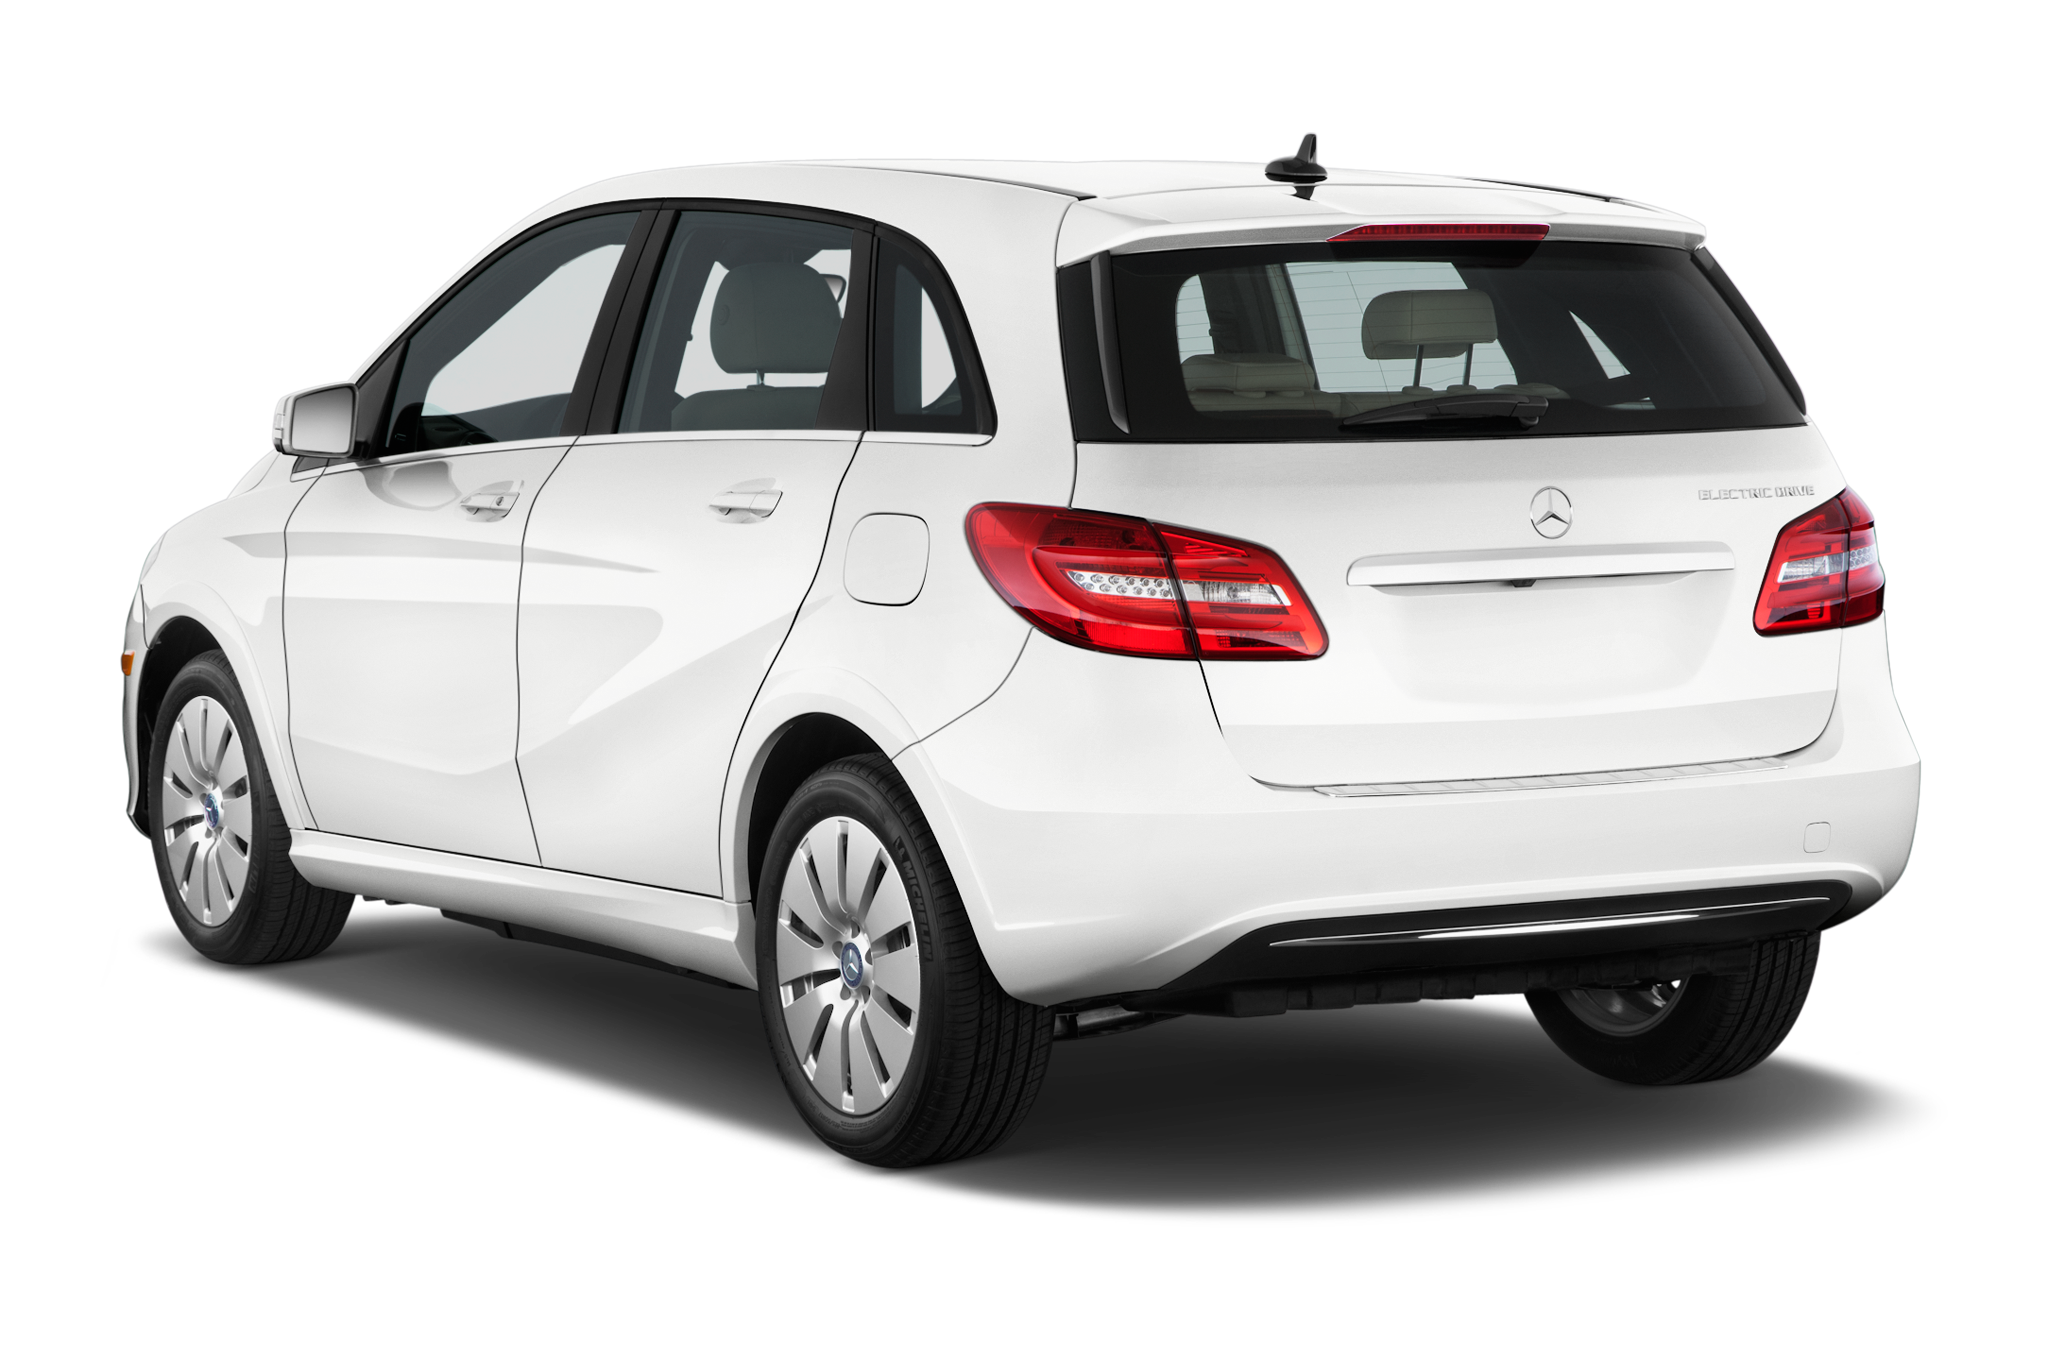 Mercedes Benz B Class Electric Drive 2014 International Price